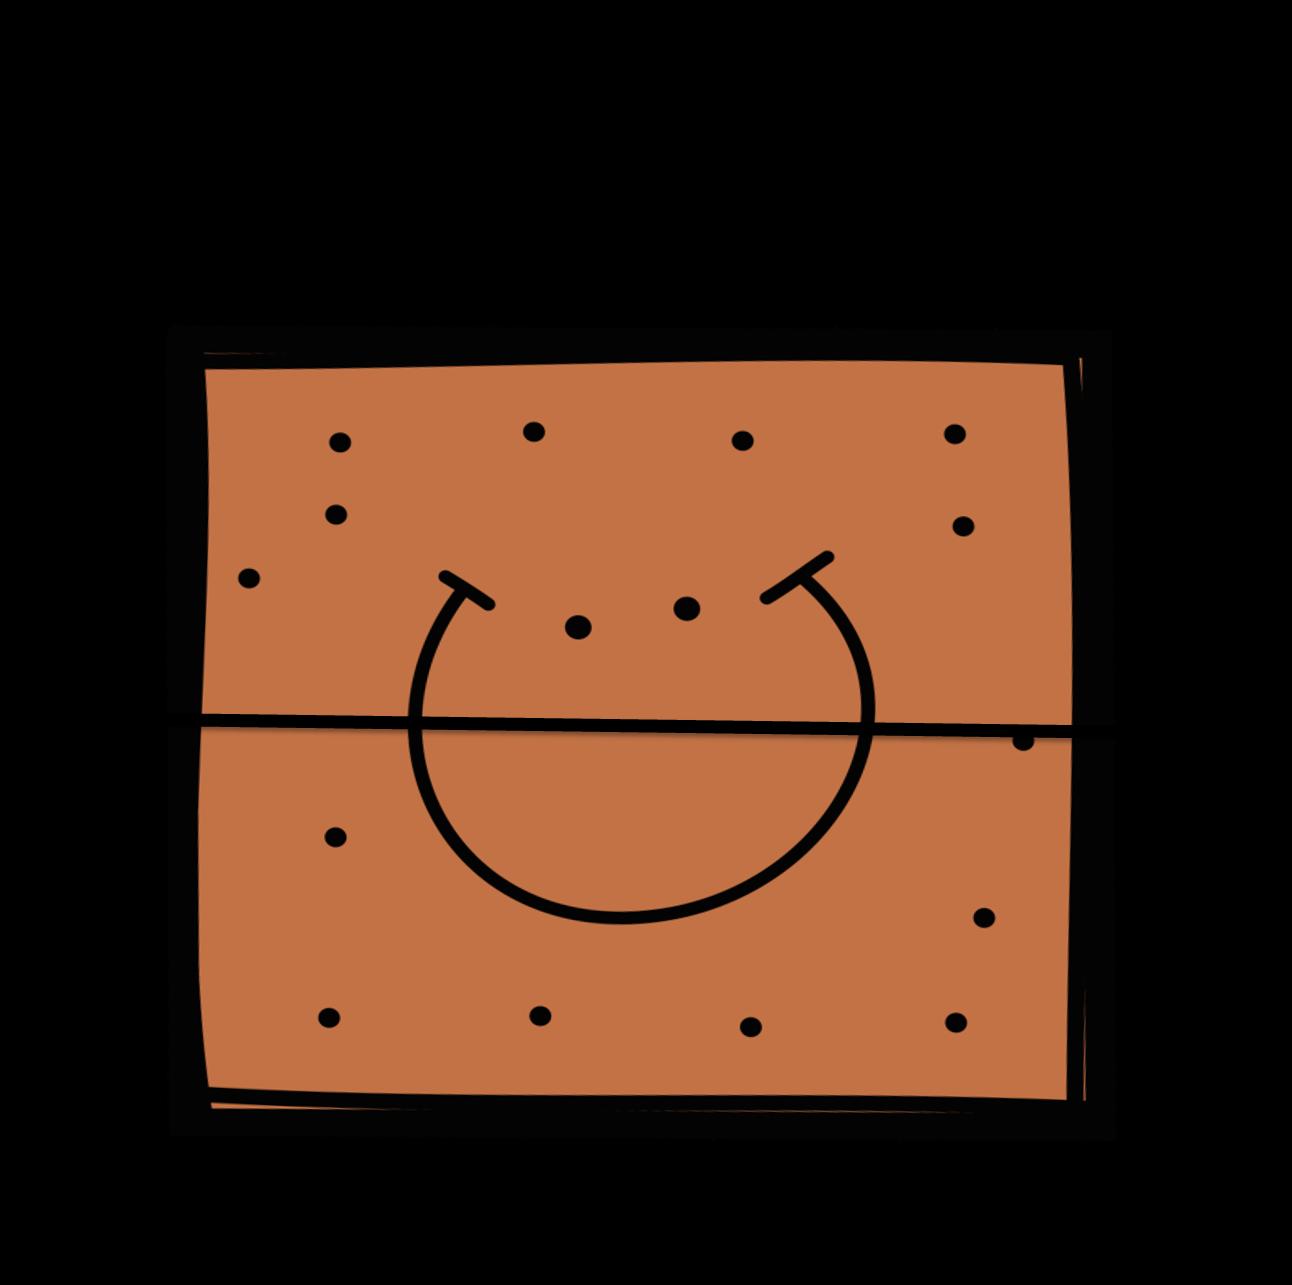 Fraction clipart rectangle fraction. Aaaaaachoo sneezy the snowman